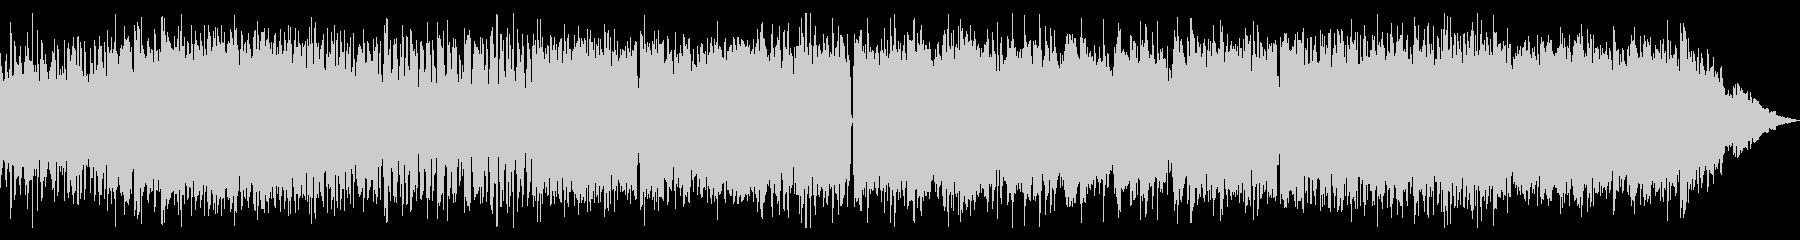 EDM + ヘヴィメタルの未再生の波形